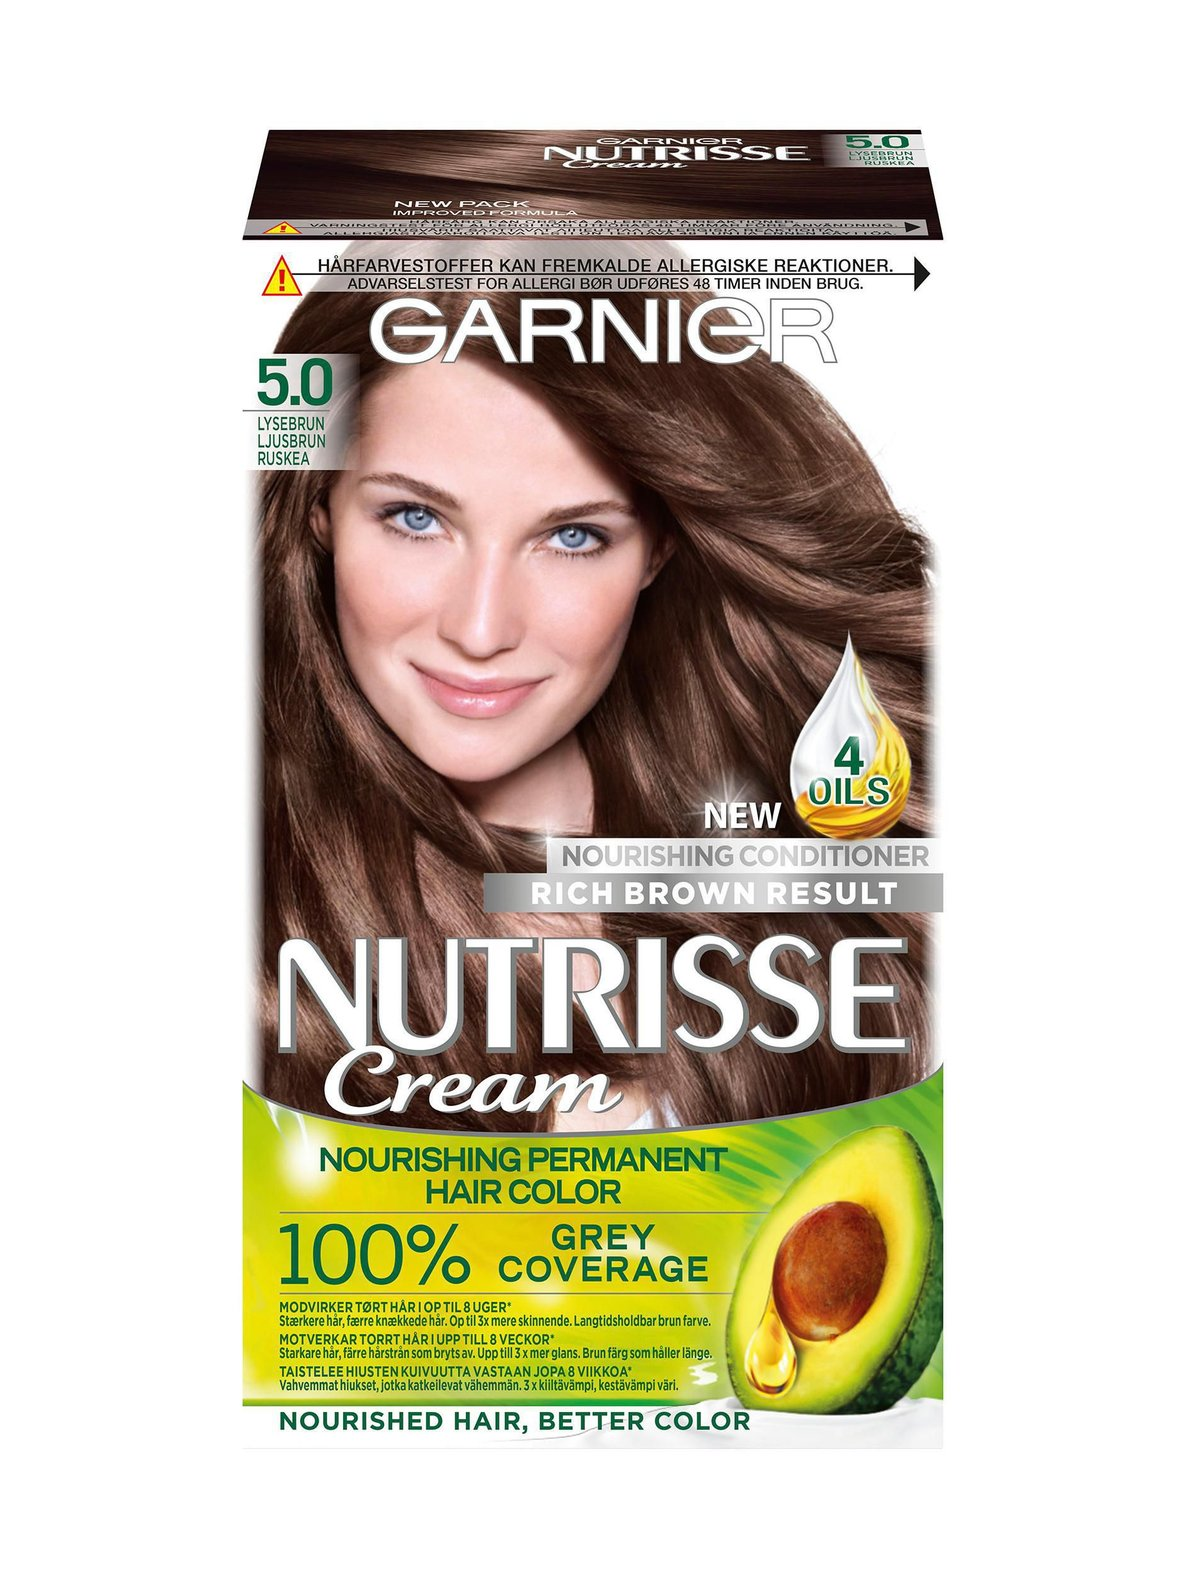 5.0 Ruskea Garnier Nutrisse Cream -kestoväri  85cc63c5d7